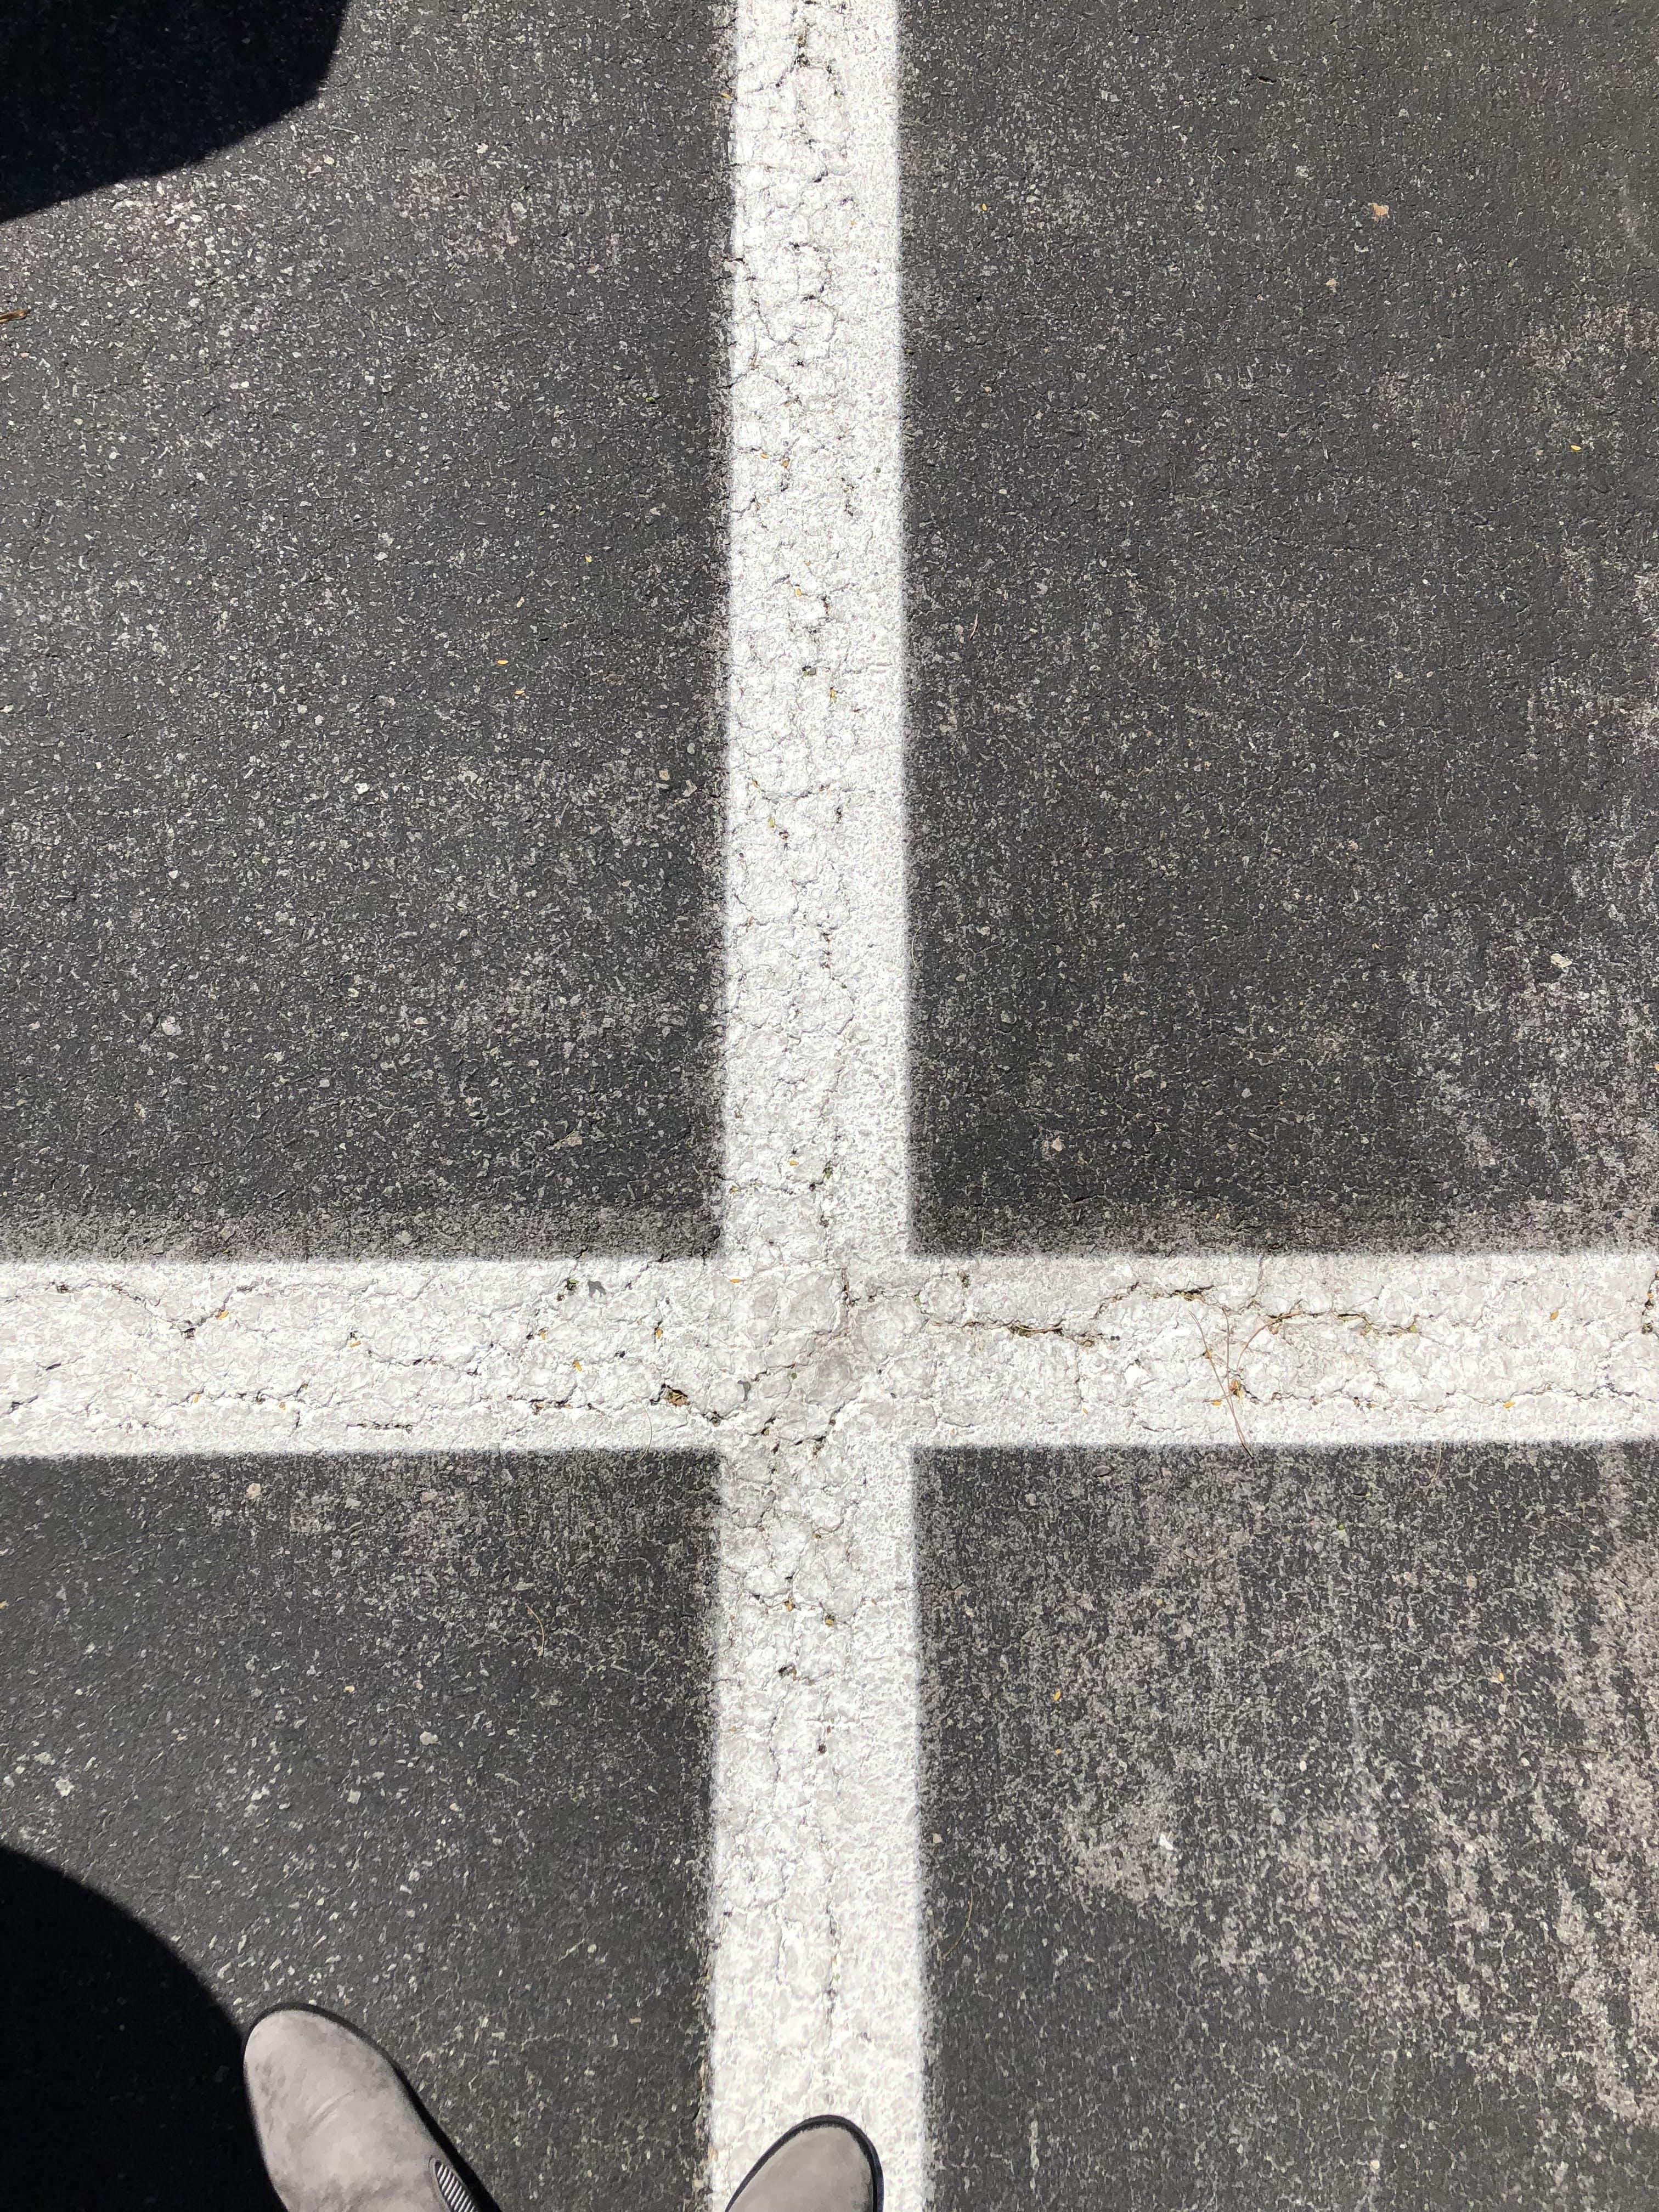 Free stock photo of cross, empty street, road, white